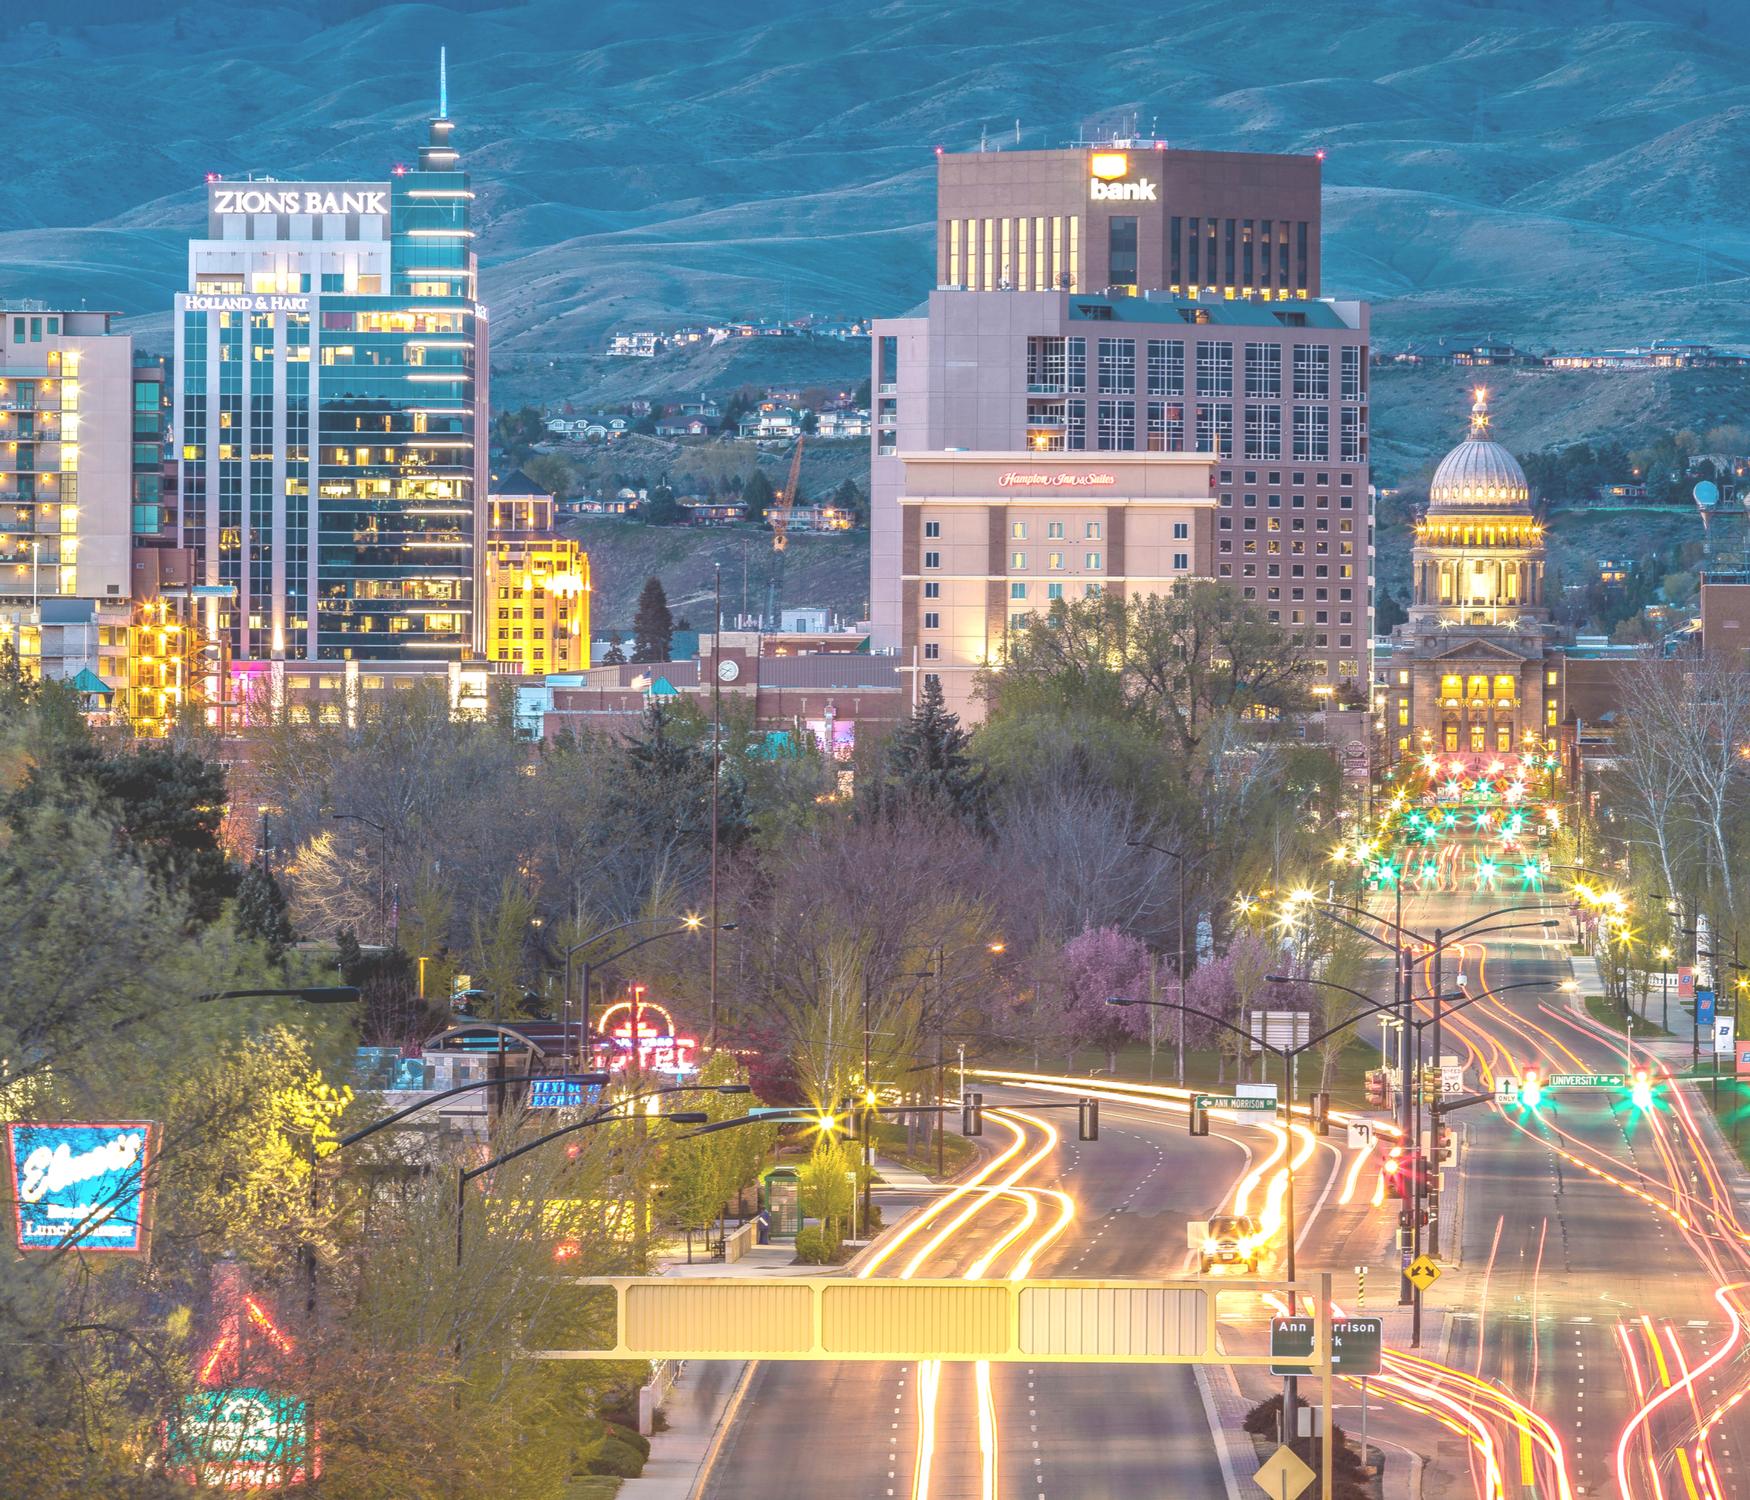 Restaurants And Bars In Boise Idaho